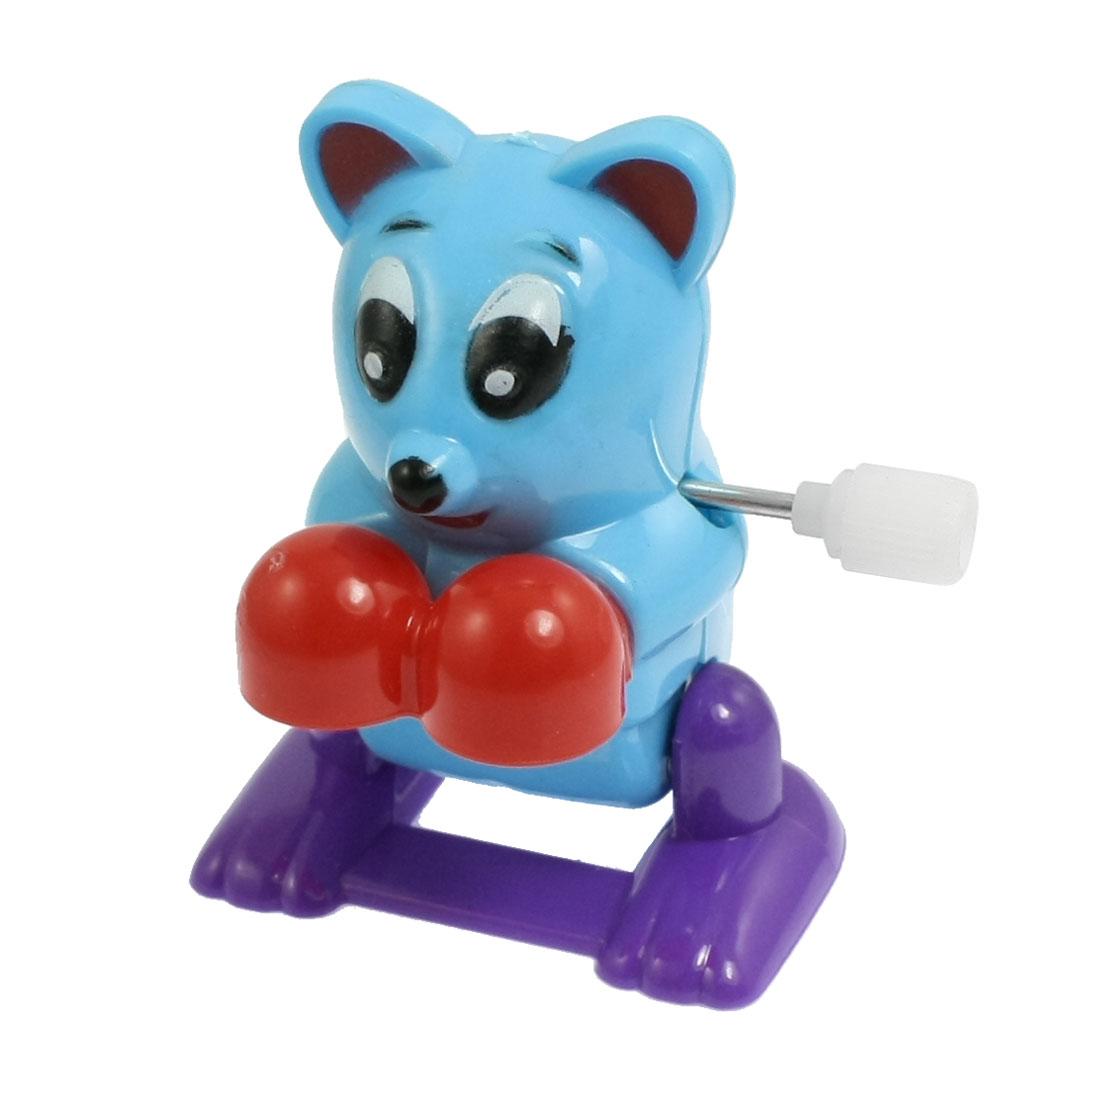 Blue Red Purple Plastic Rat Shape Wind Up Clockwork Toy for Children